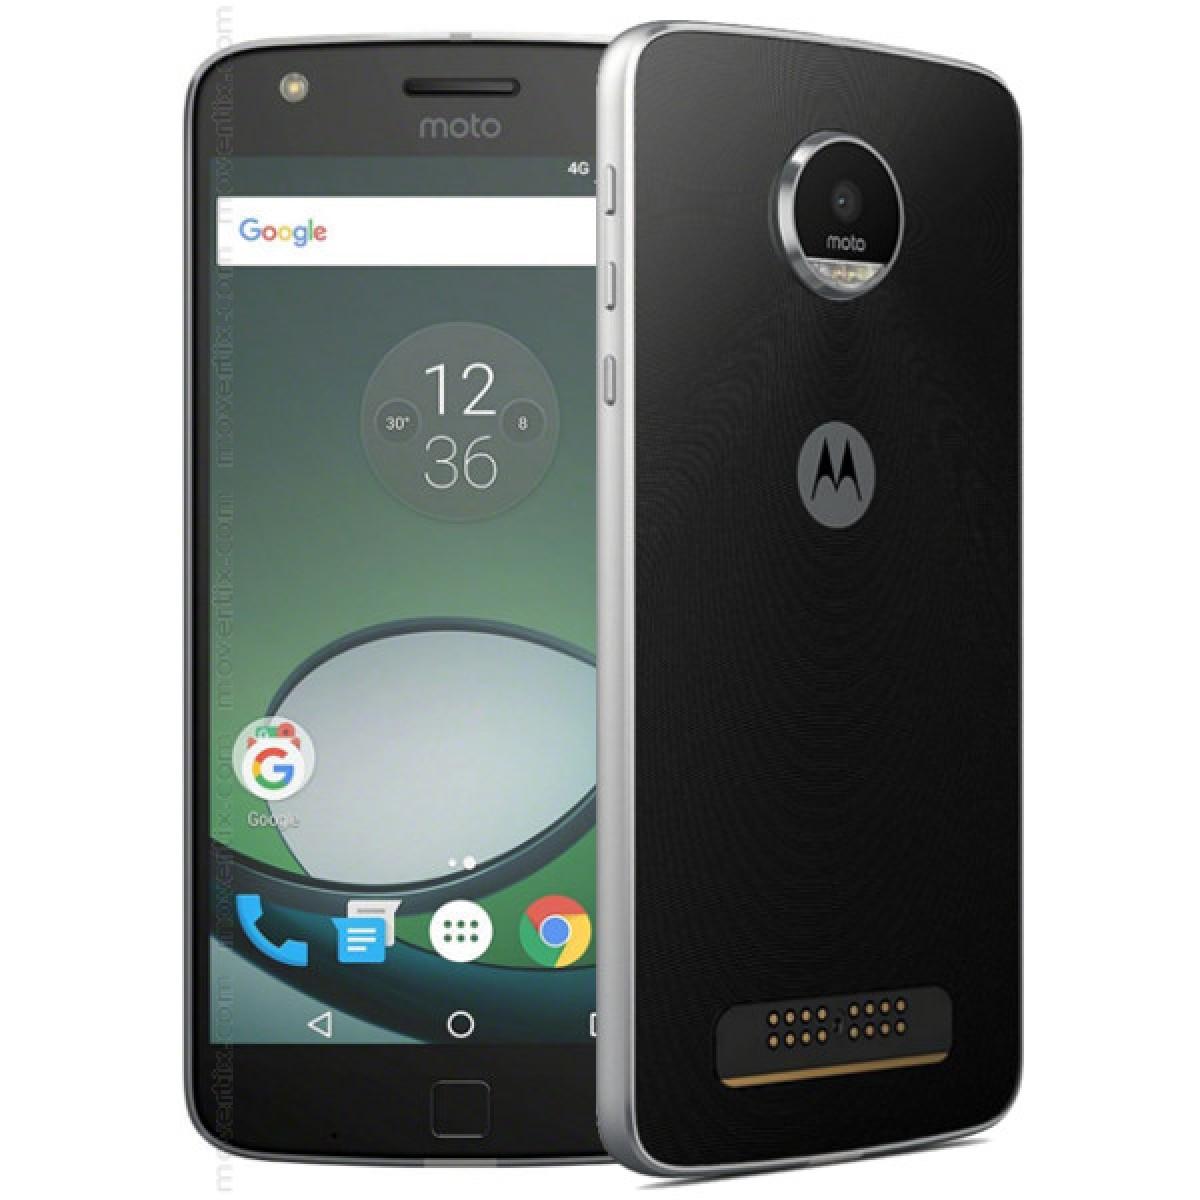 moto z play. Motorola Moto Z Play Dual SIM Black